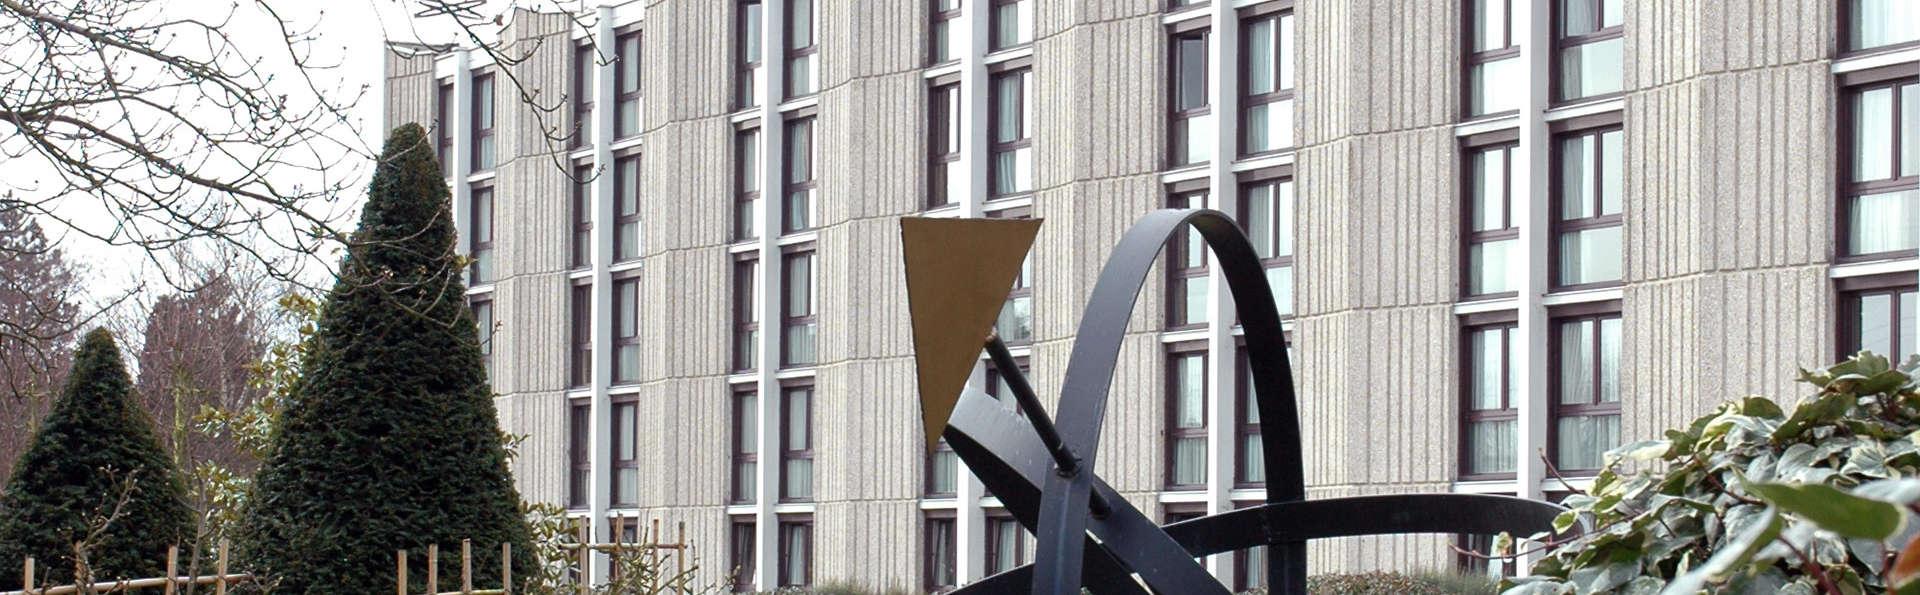 Mercure Grand Lille - EDIT_front1.jpg